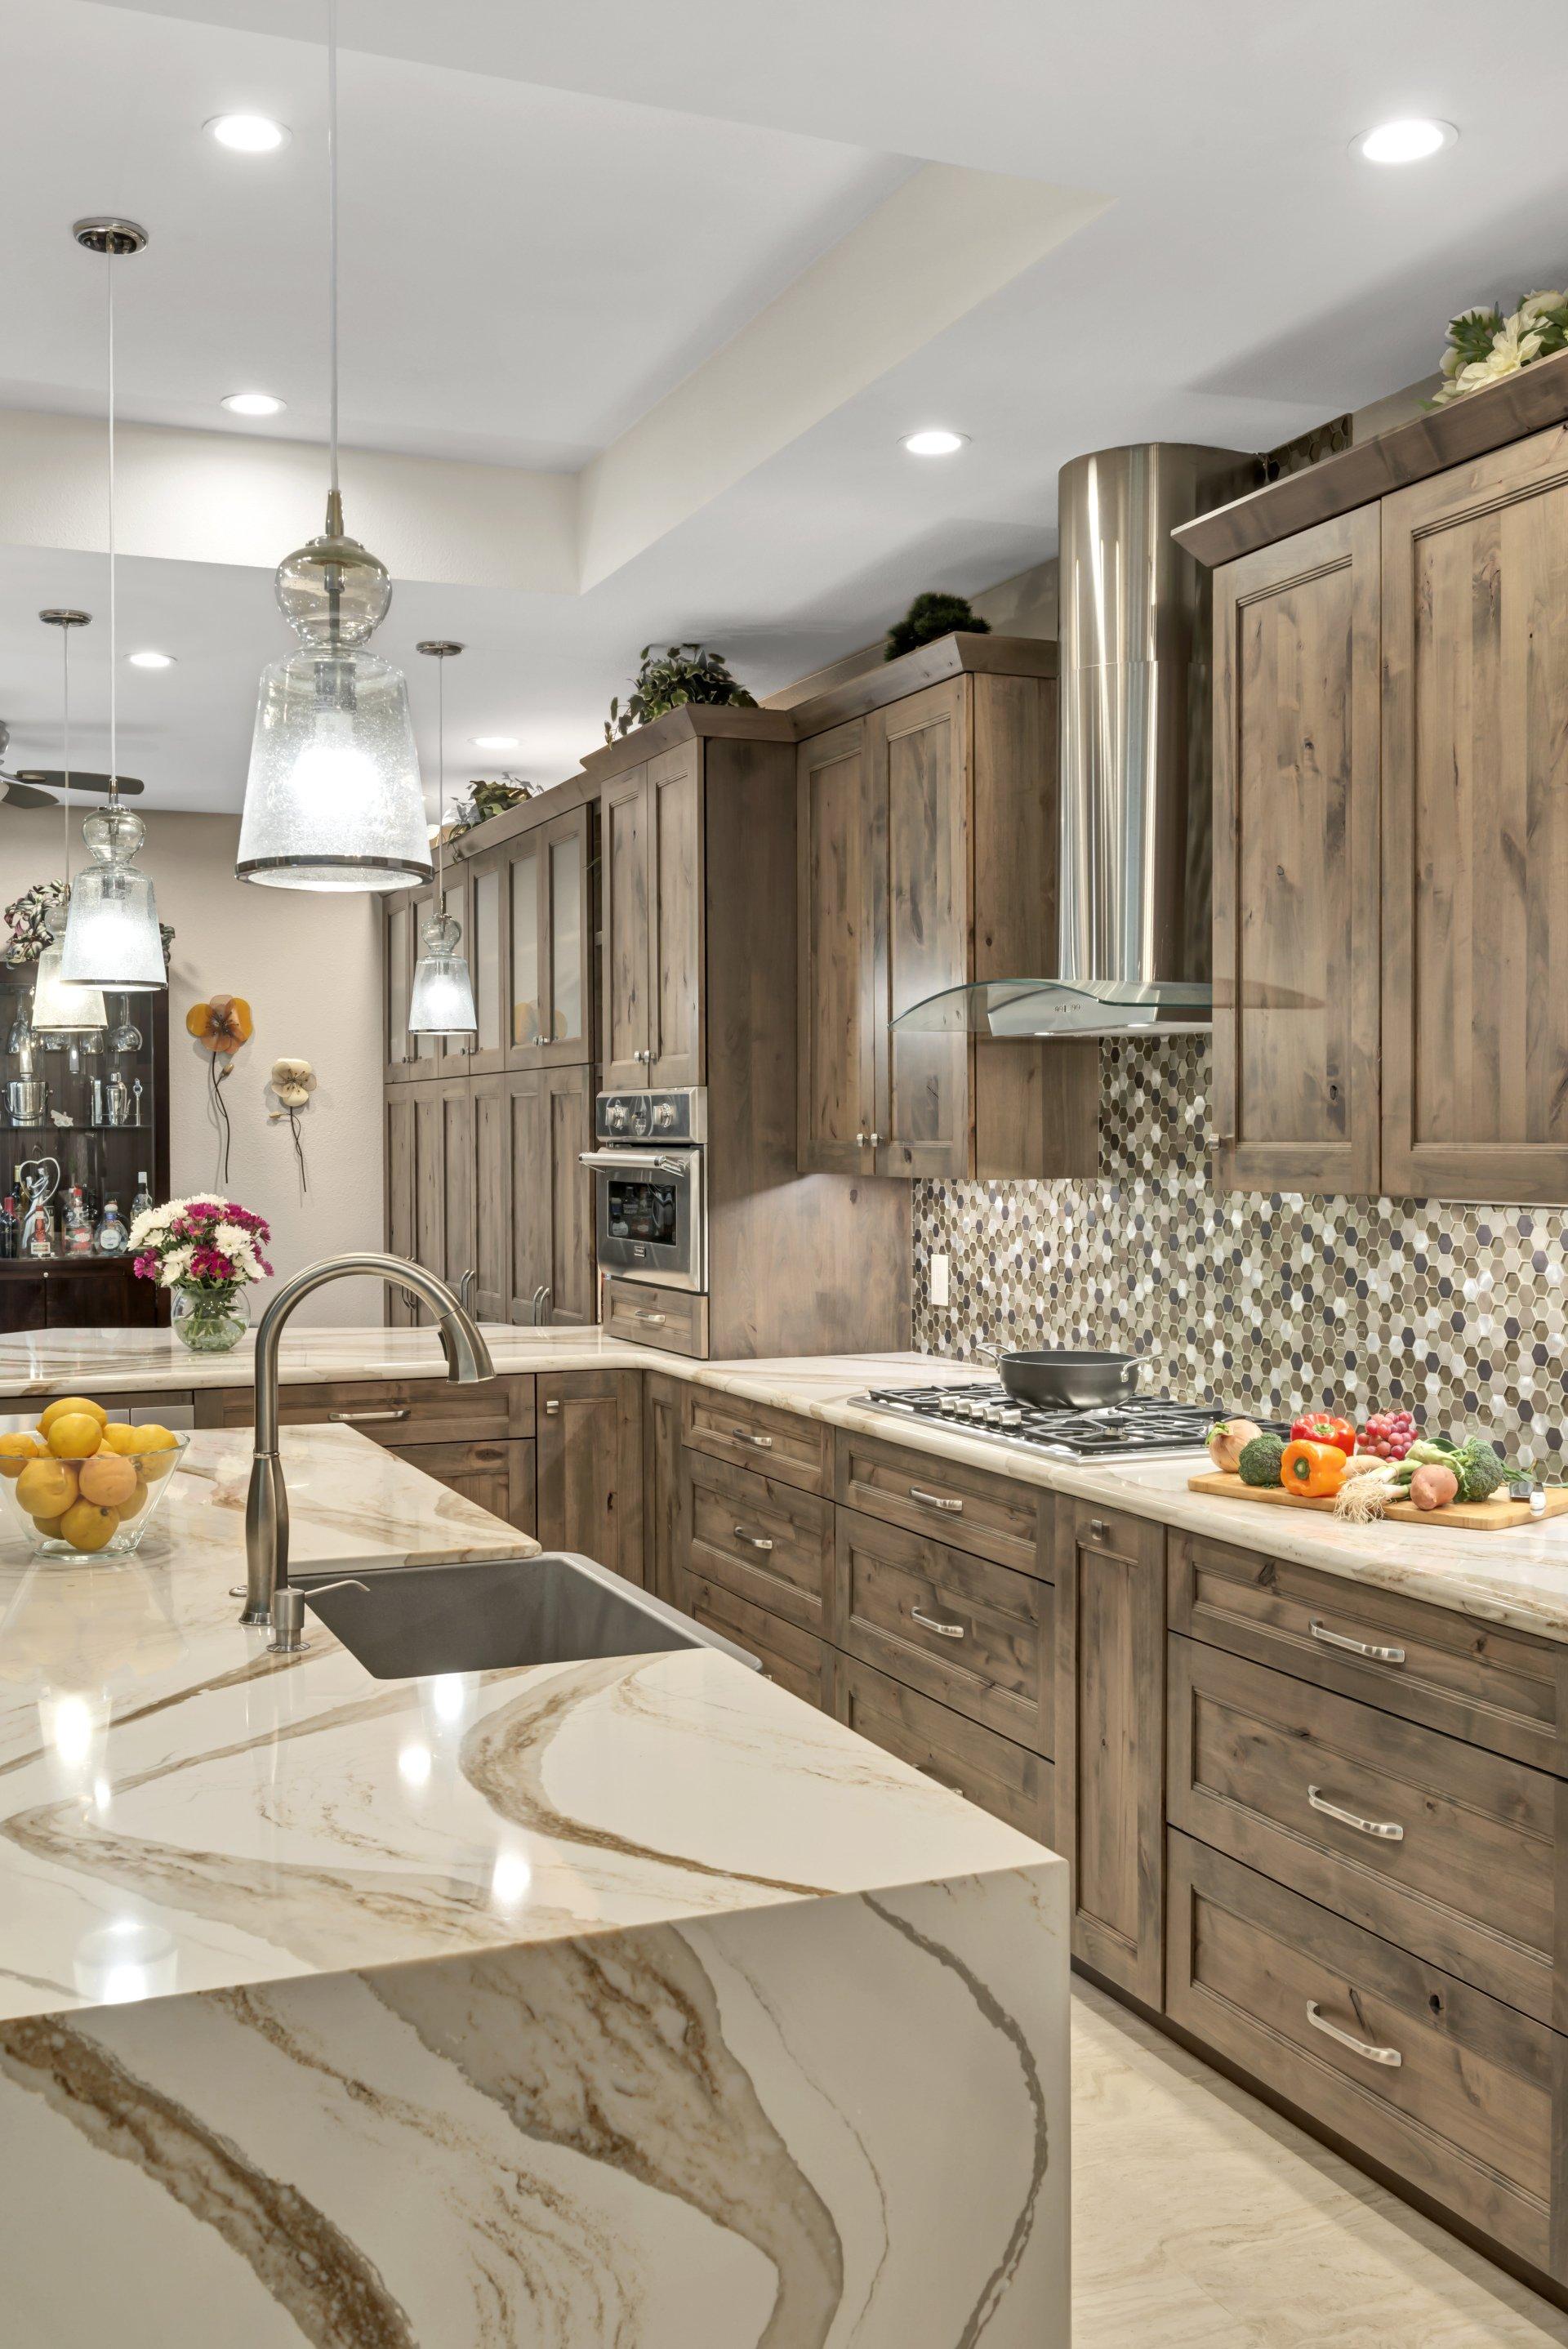 Kitchen Designer Palm Desert Ca Bathroom Remodel Kitchen Remodel